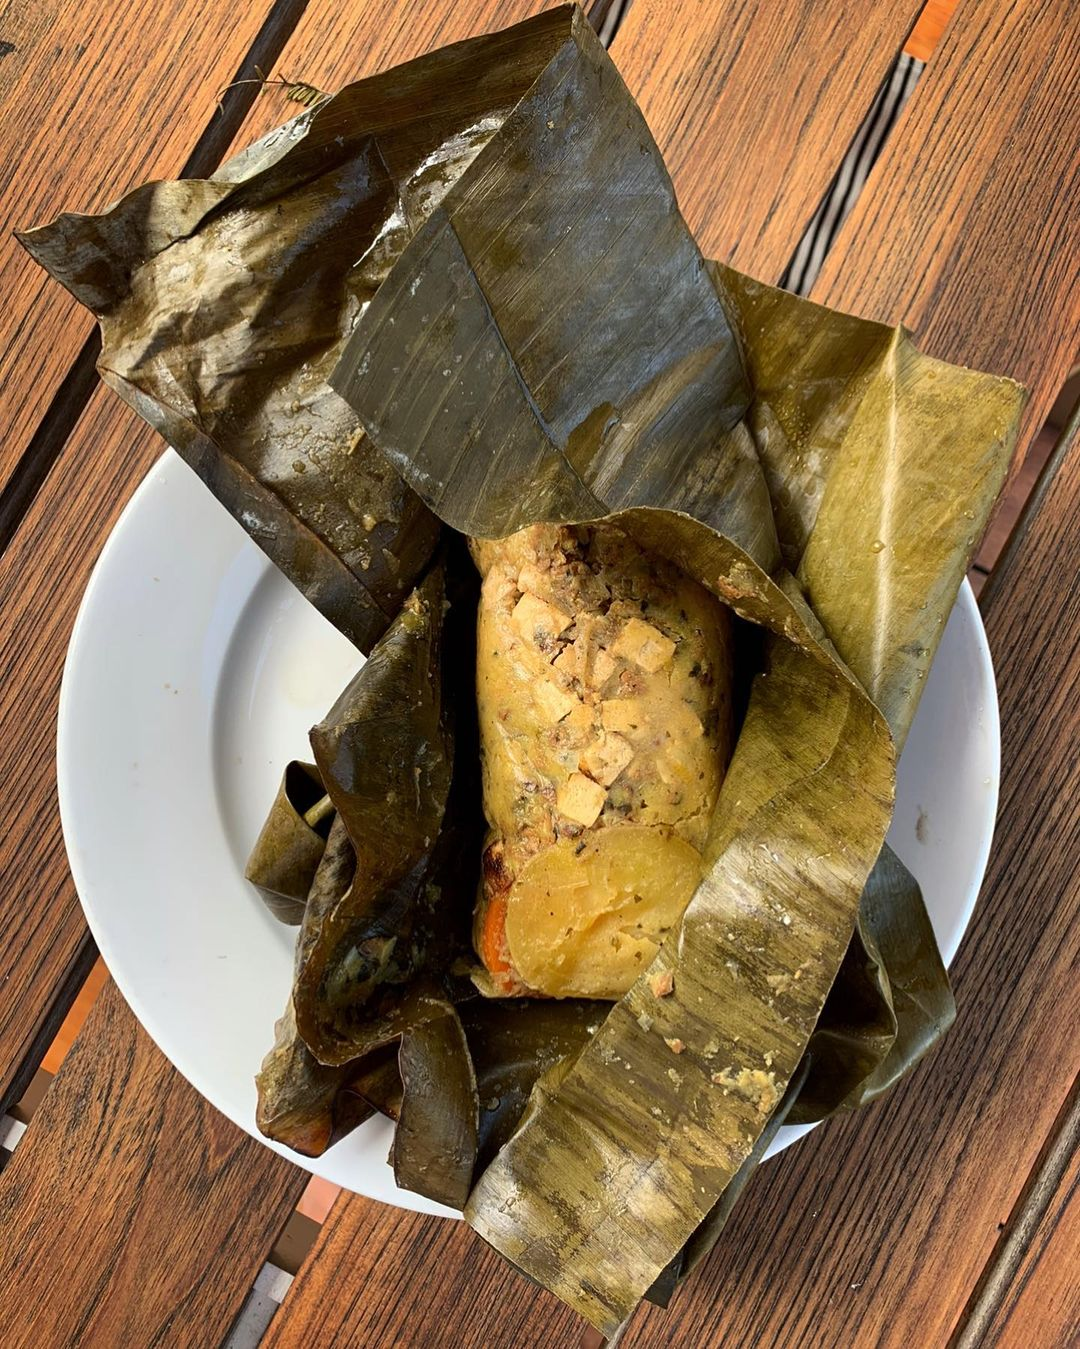 tamales colombianos comida tipica colombia